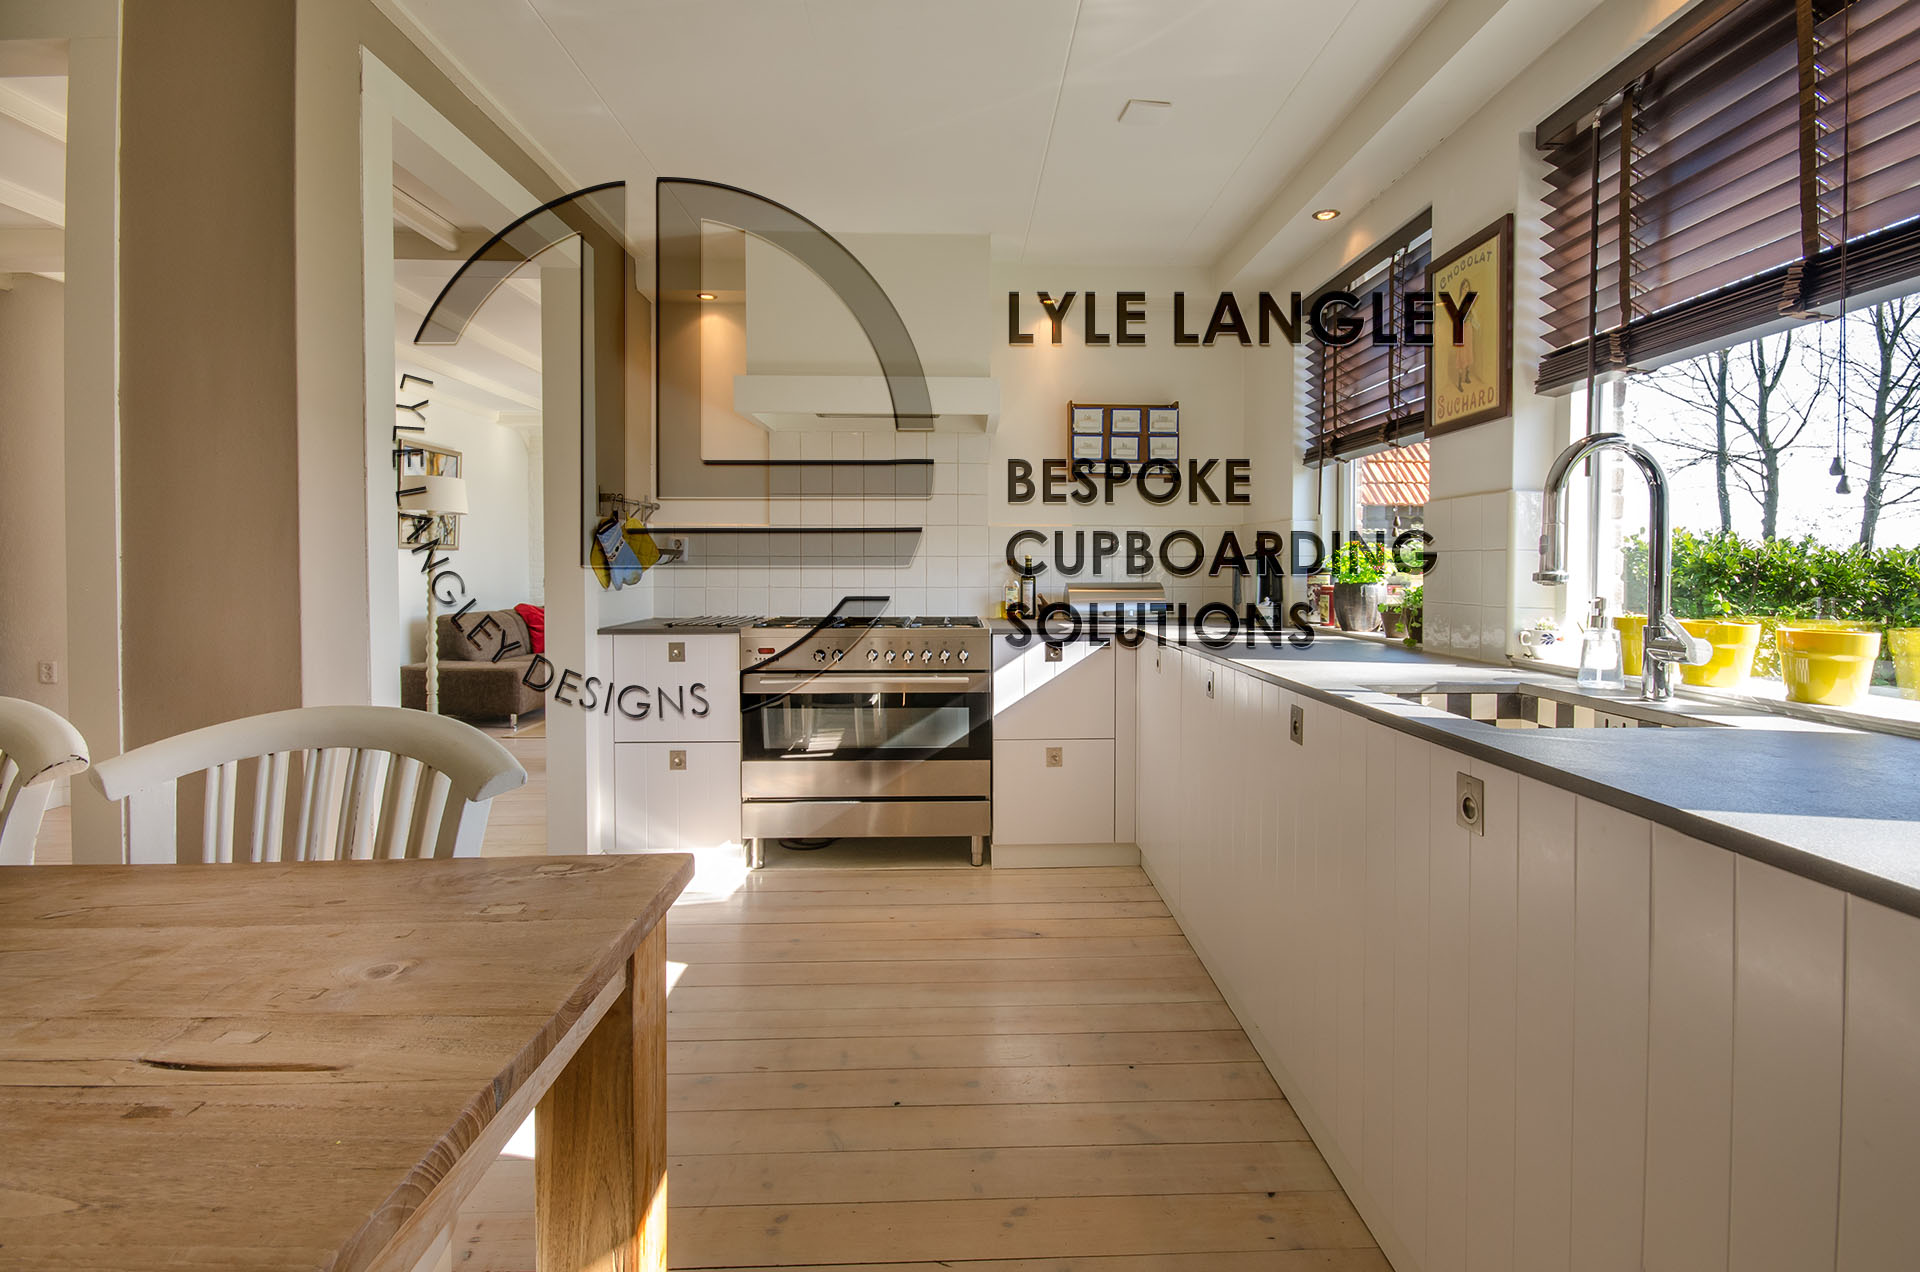 Lyle Langley Designs